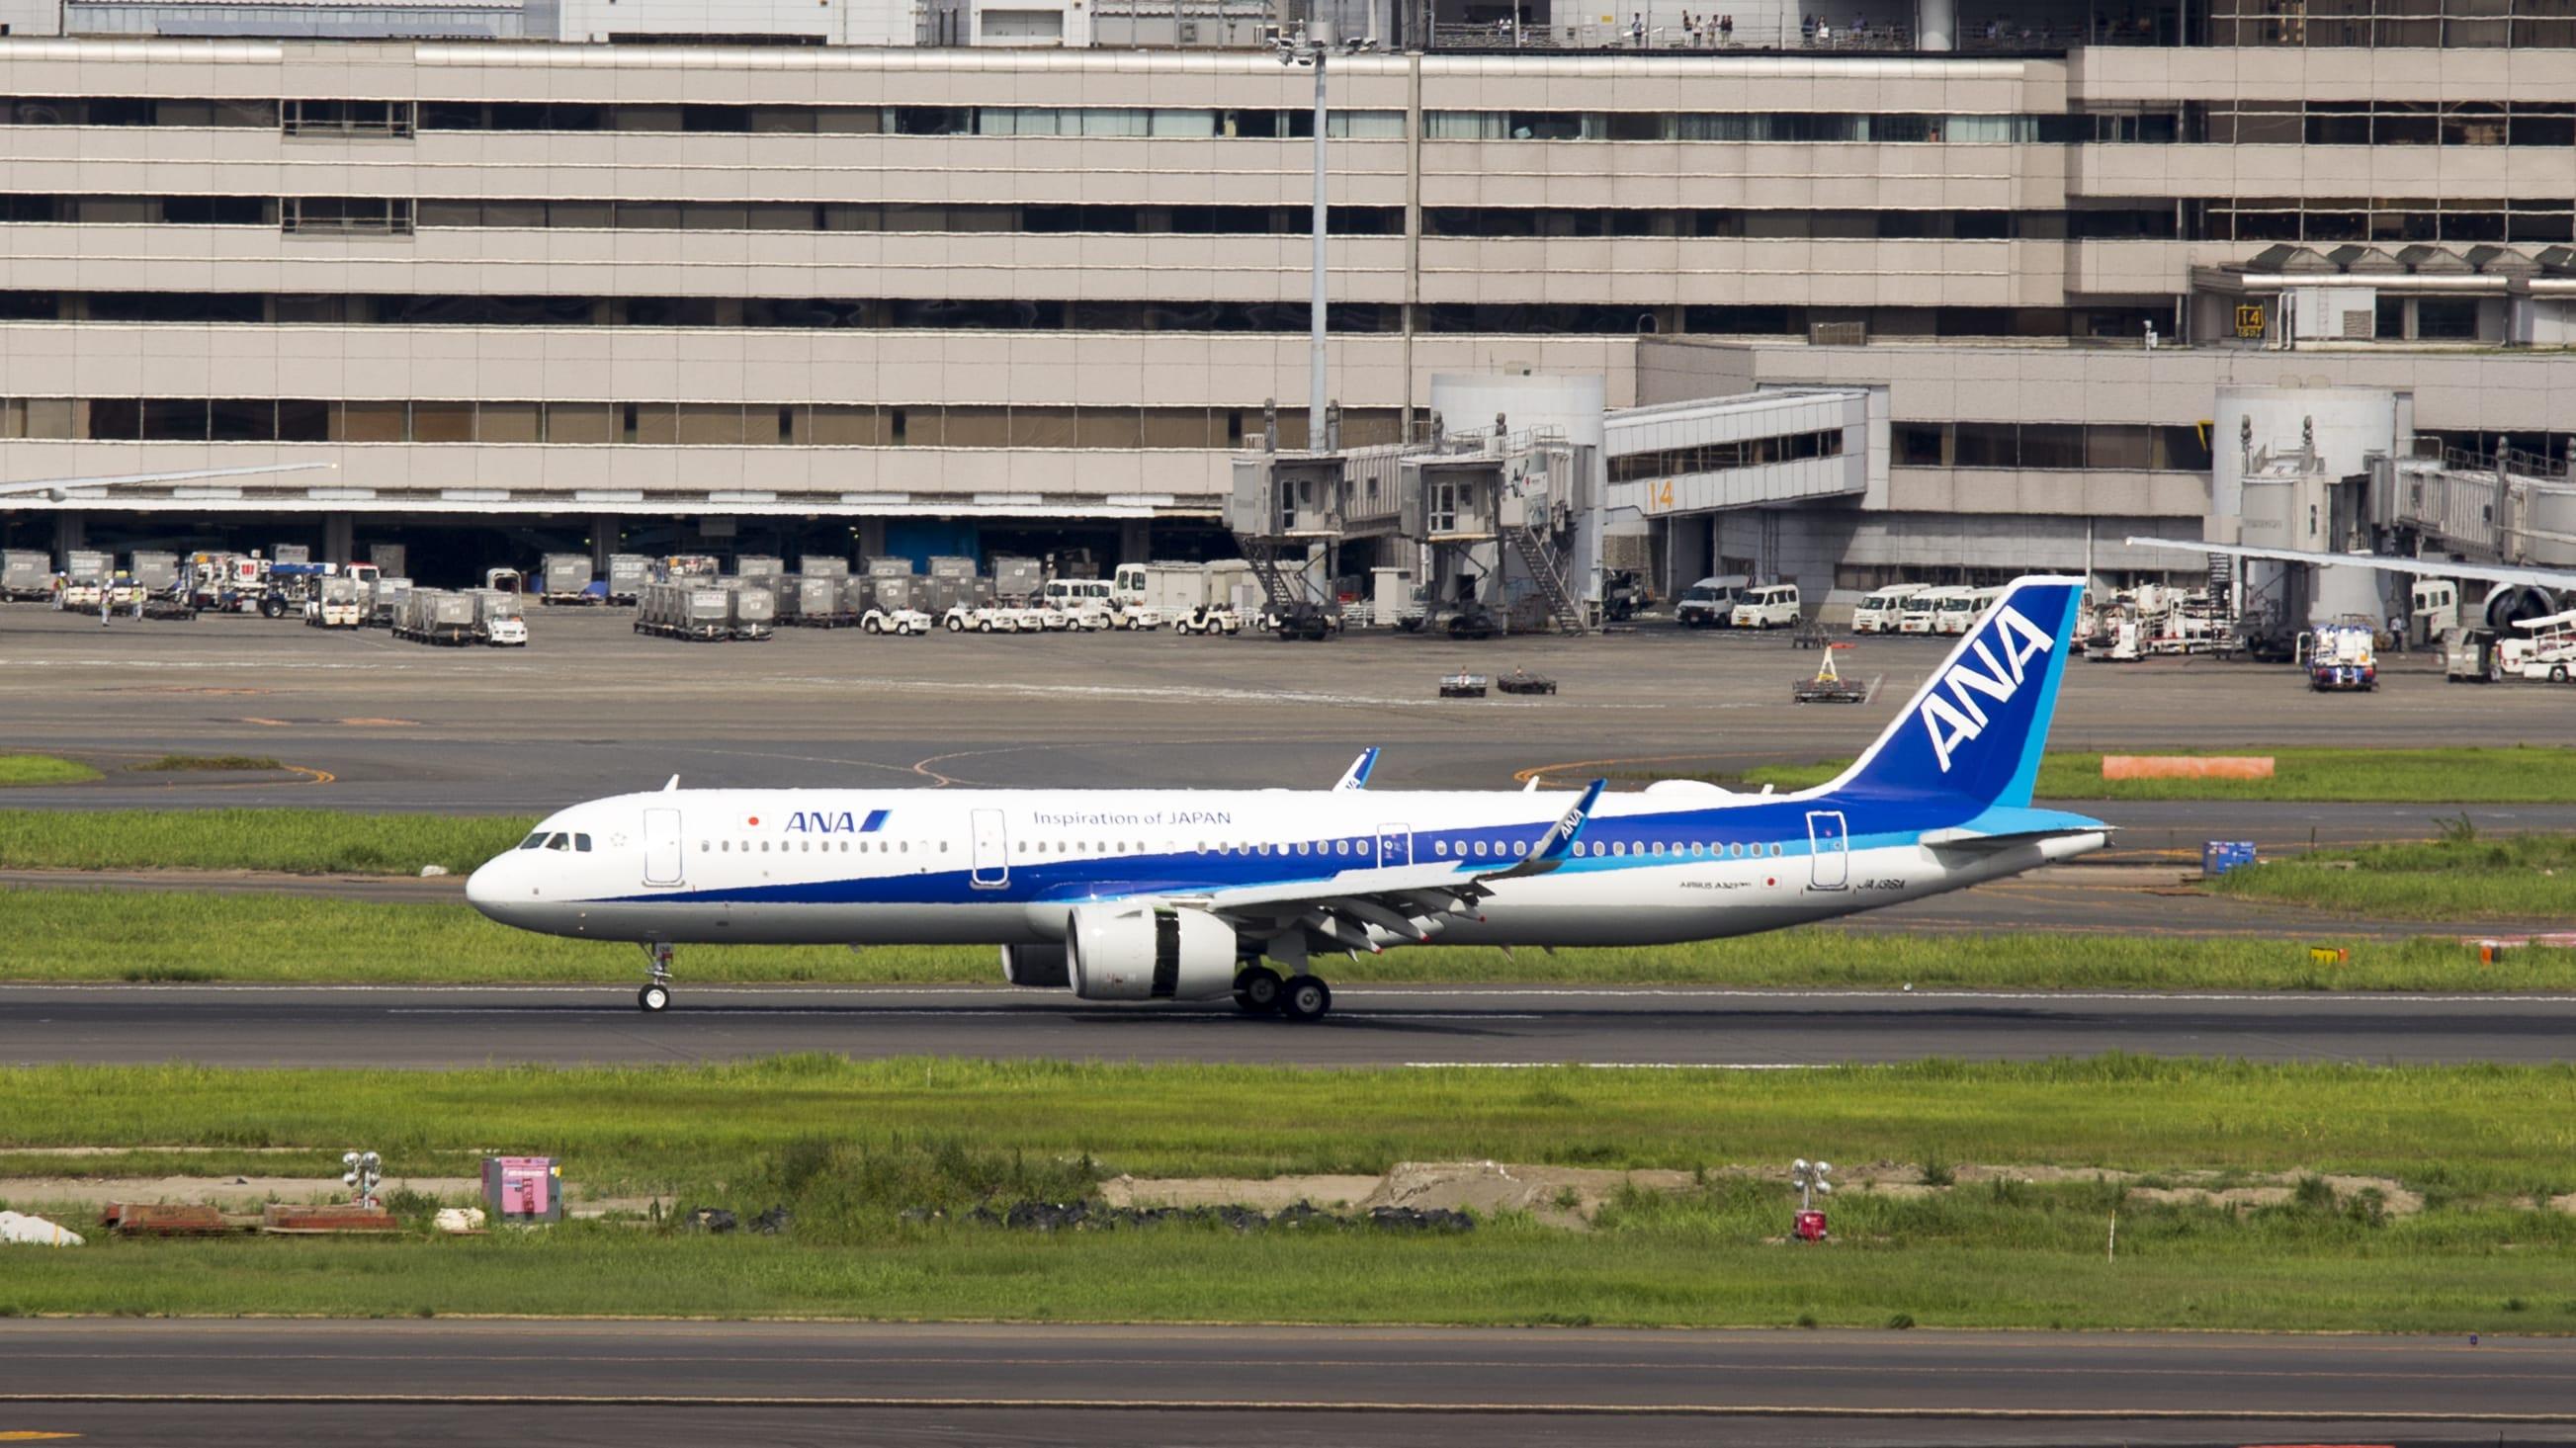 Airbus A321-272N